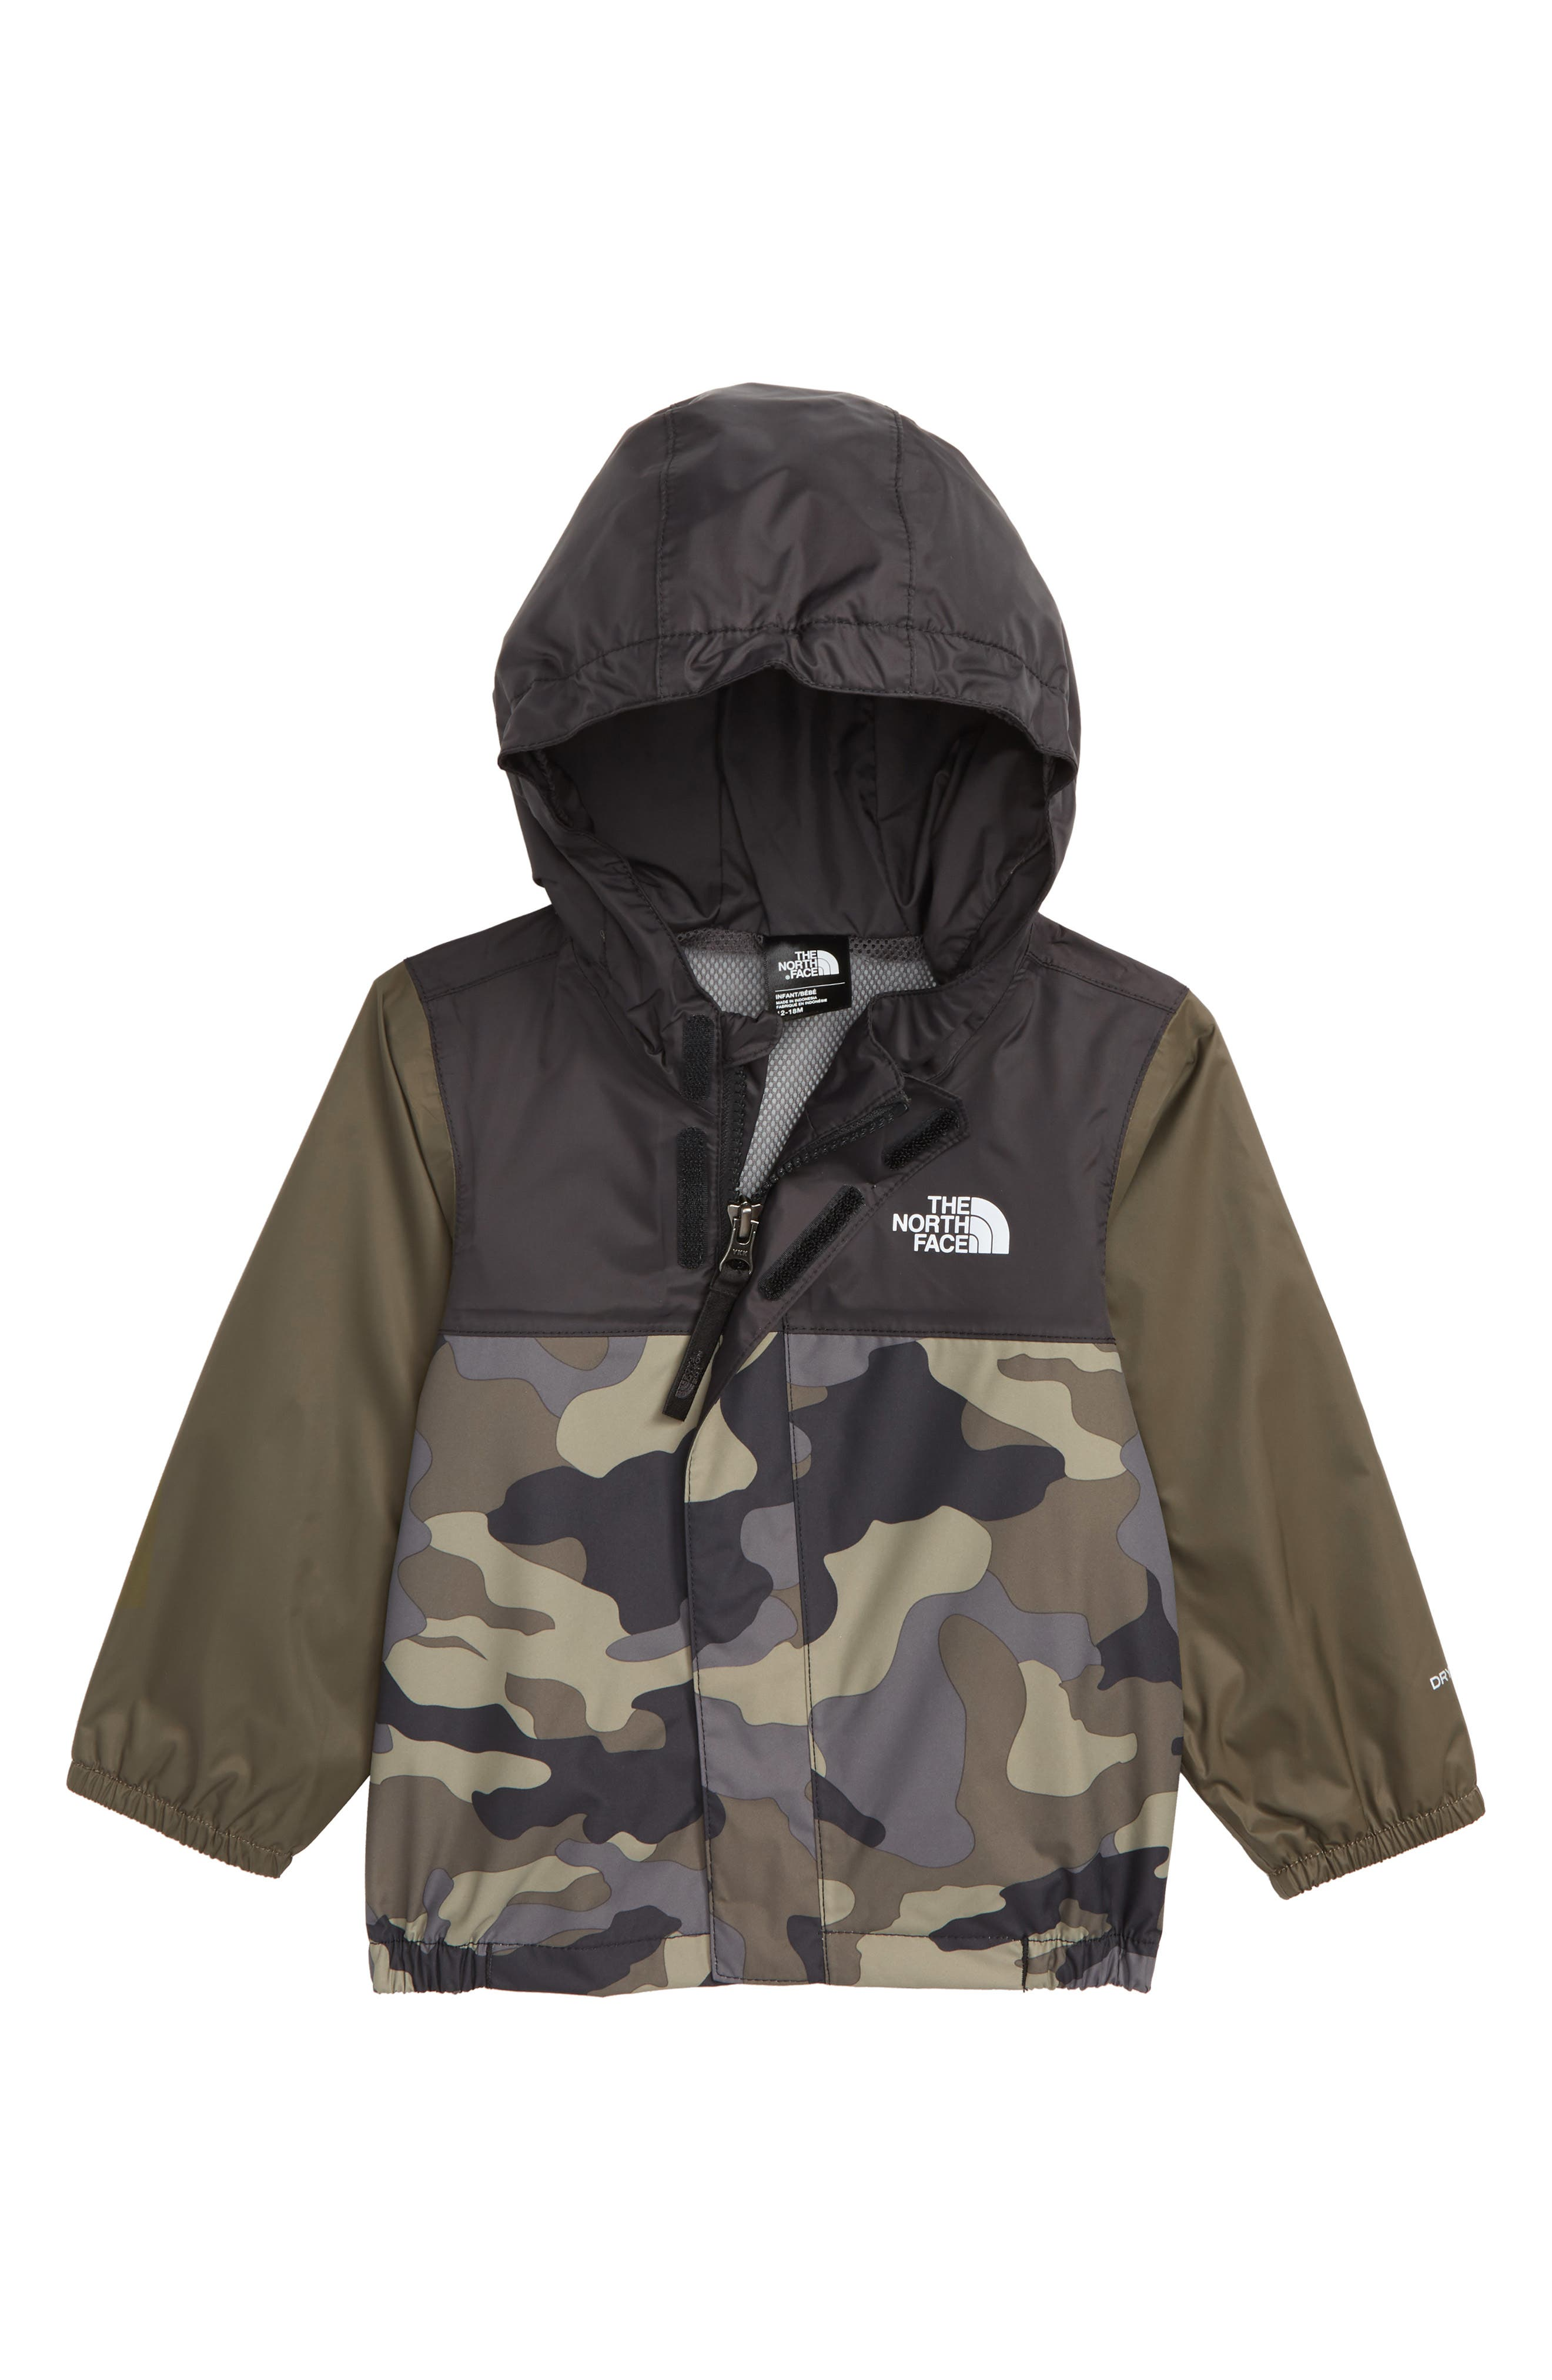 Tailout Hooded Rain Jacket,                             Main thumbnail 1, color,                             TAUPE/ GREEN CAMO PRINT